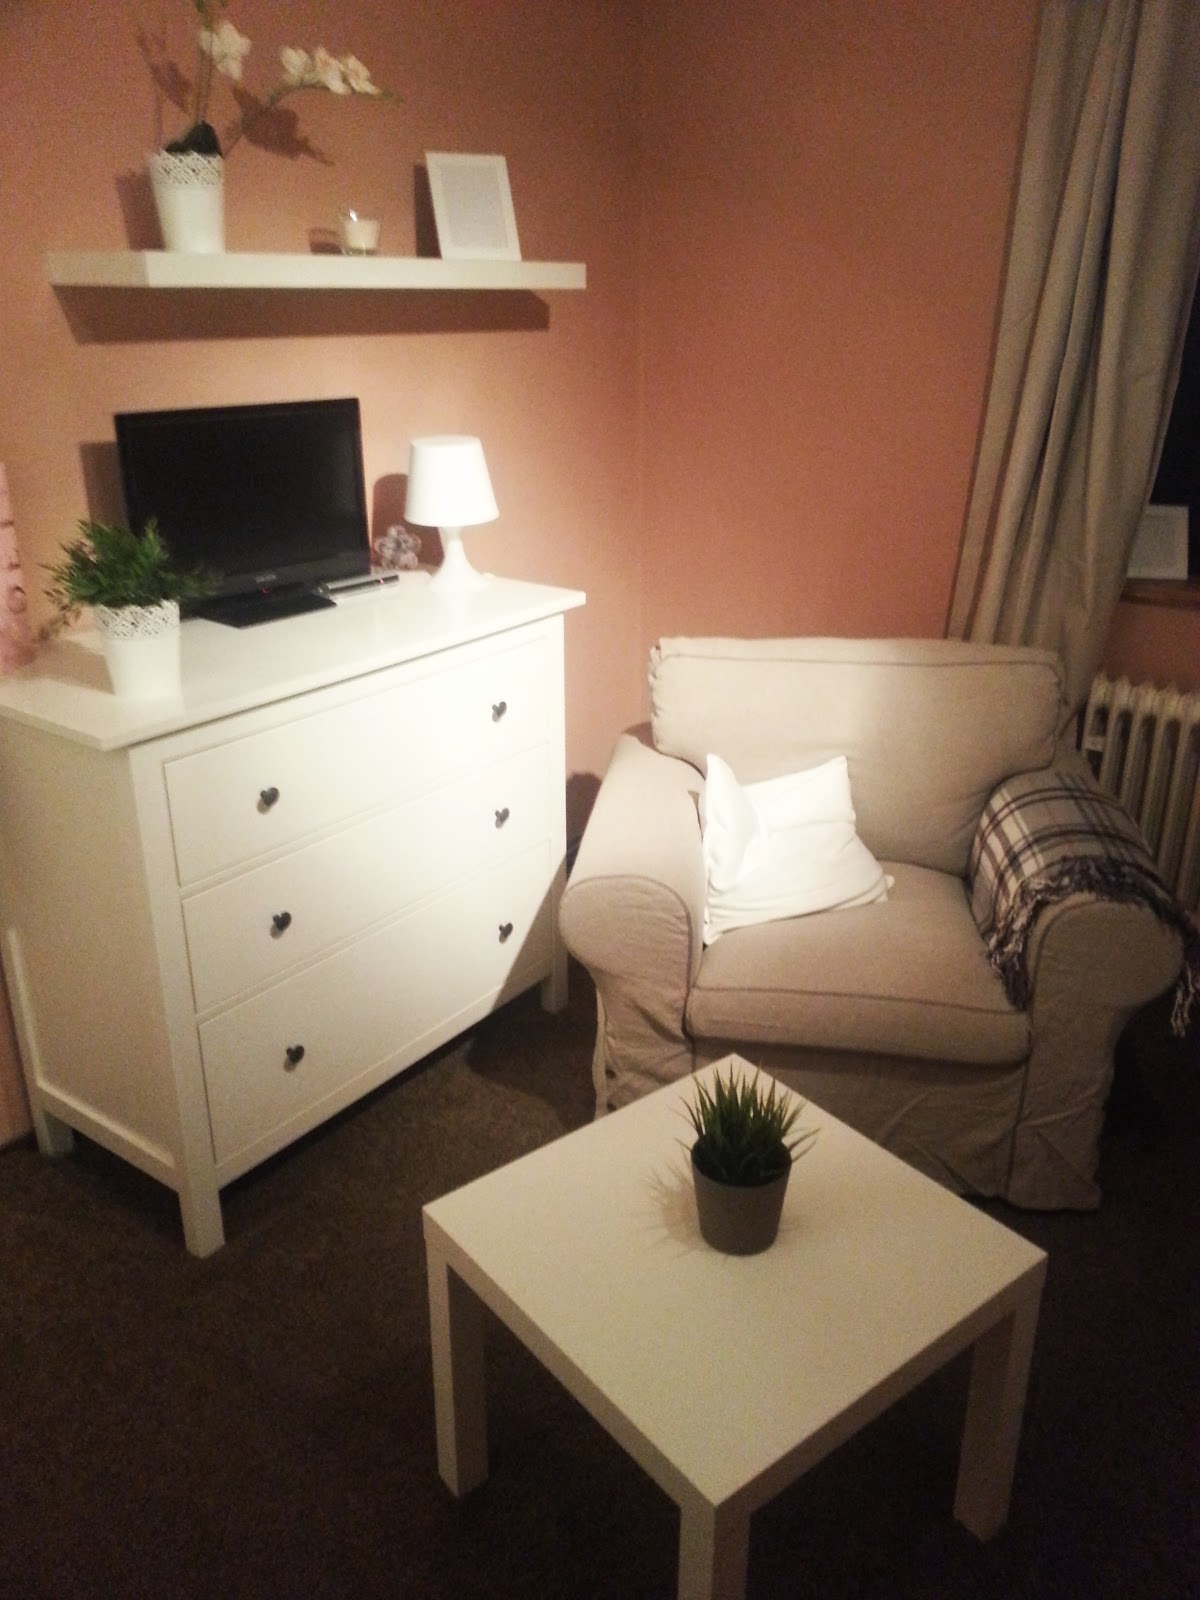 never stop dreaming klein aber fein mein zimmer. Black Bedroom Furniture Sets. Home Design Ideas